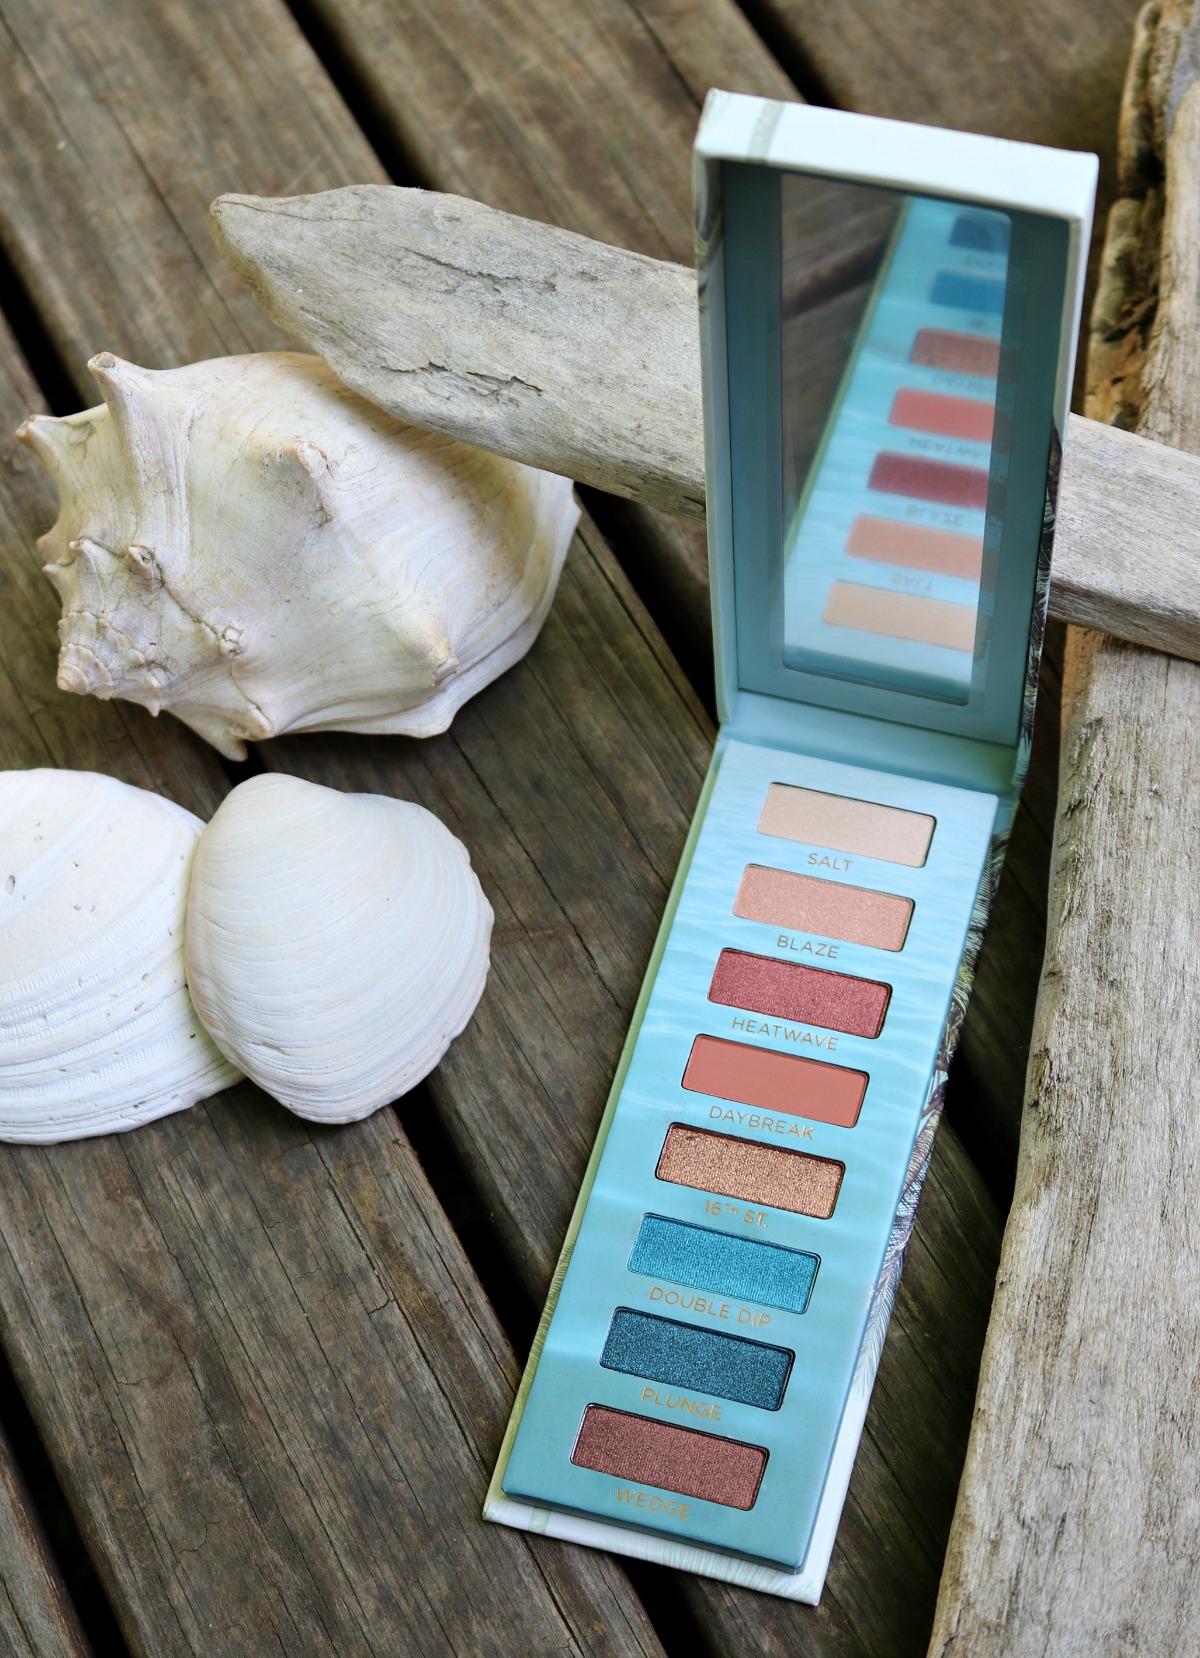 Summer 2018 Urban Decay Beached Eyeshadow Palette #SummerMakeup #CrueltyFreeBeauty #CrueltyFree #UrbanDecay